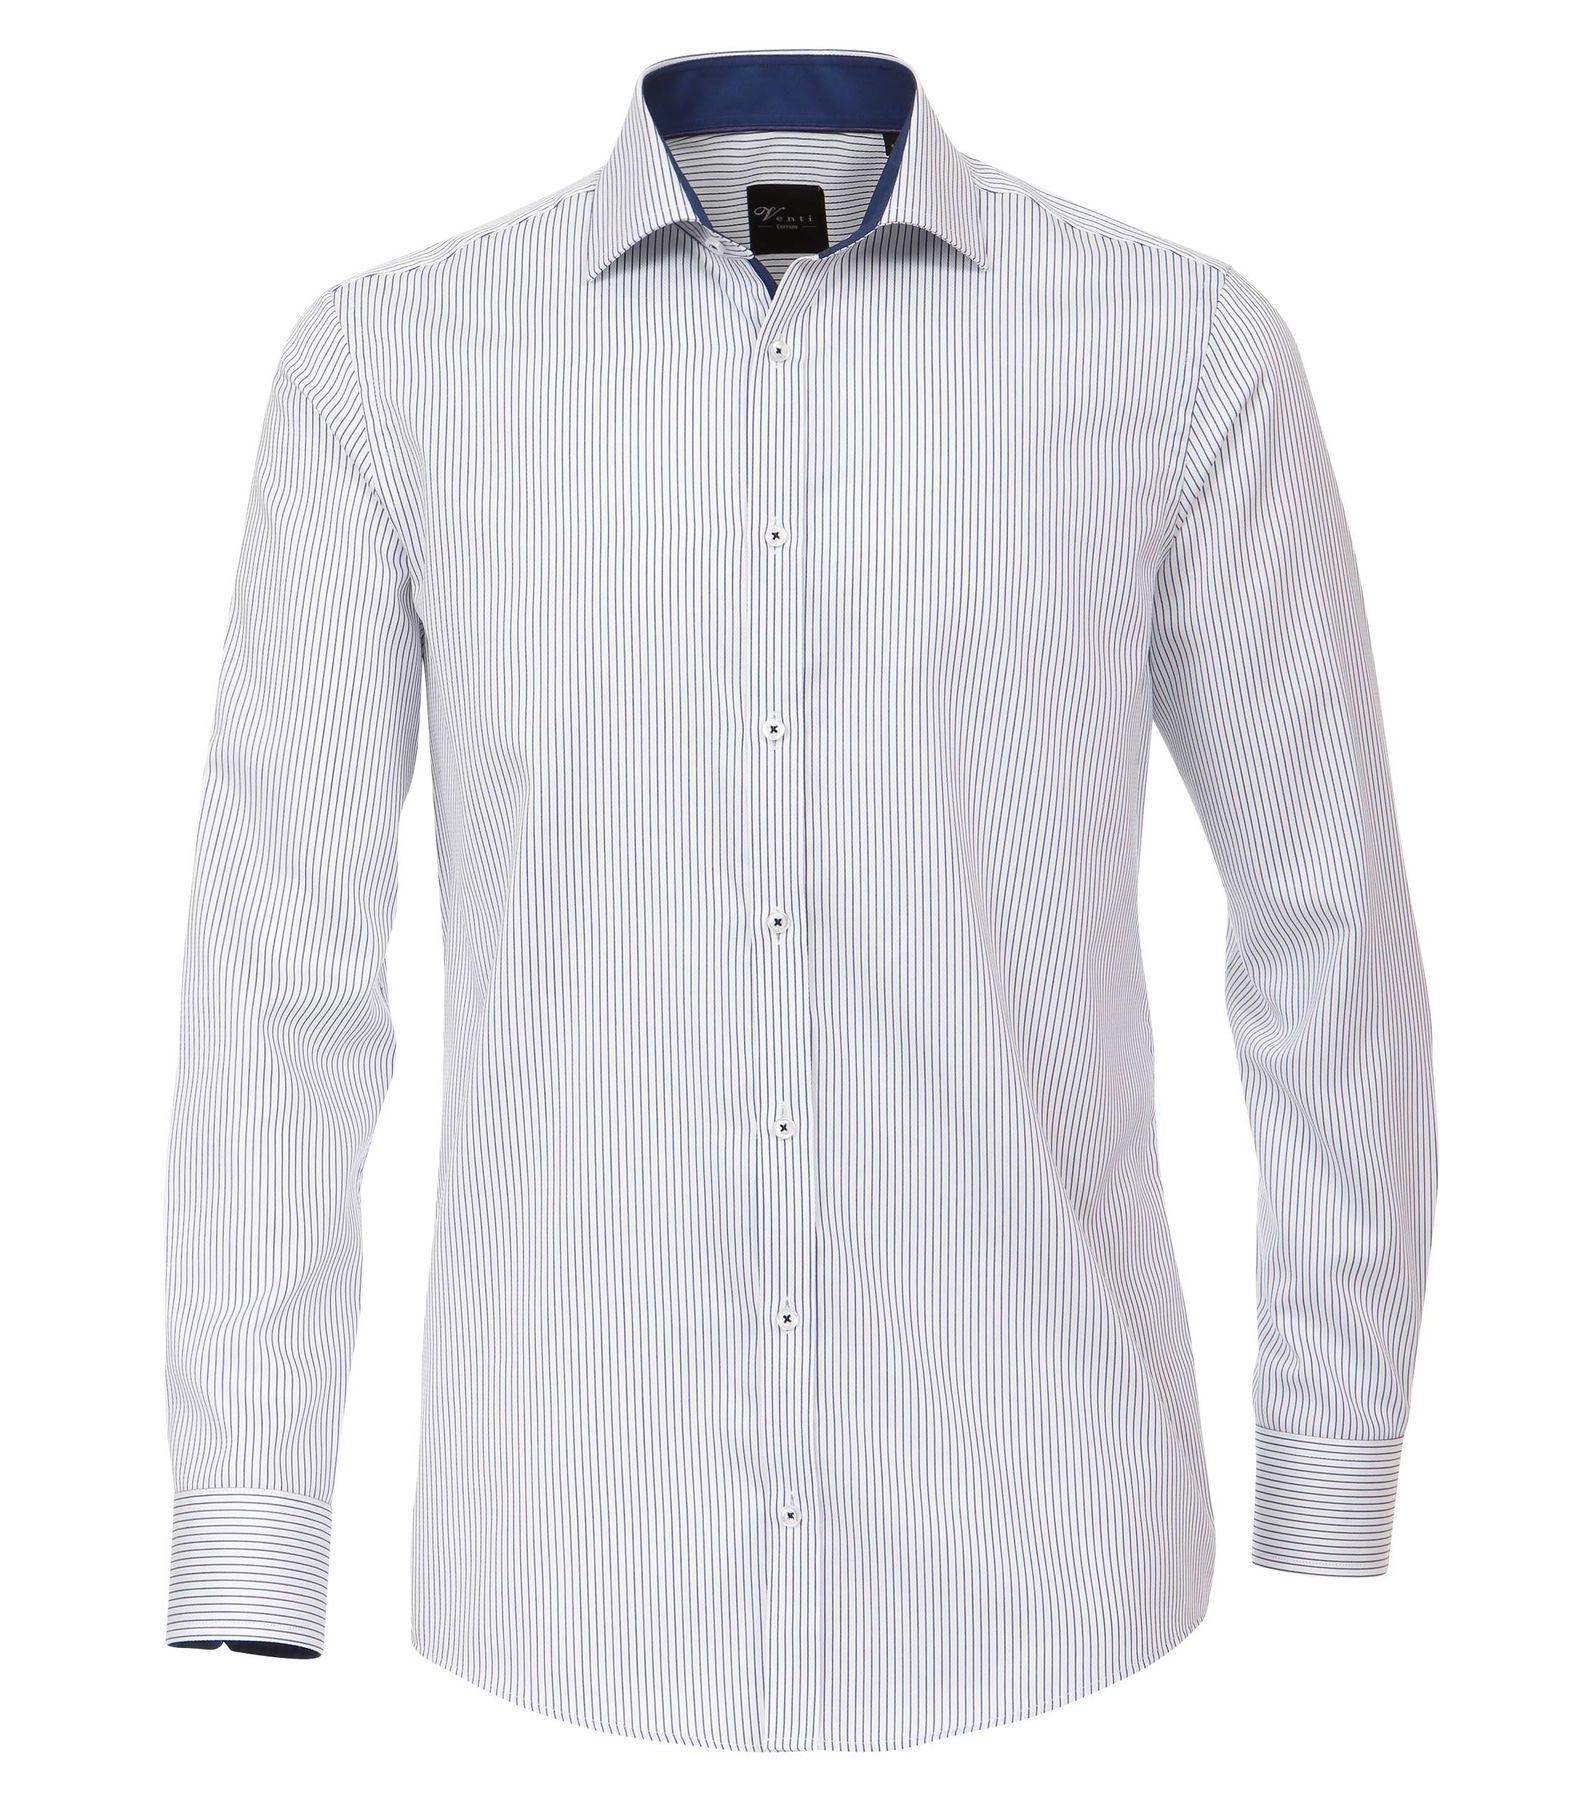 Venti - Slim Fit - Herren Langarm Hemd gestreift mit Kent Kragen (172678700) – Bild 1